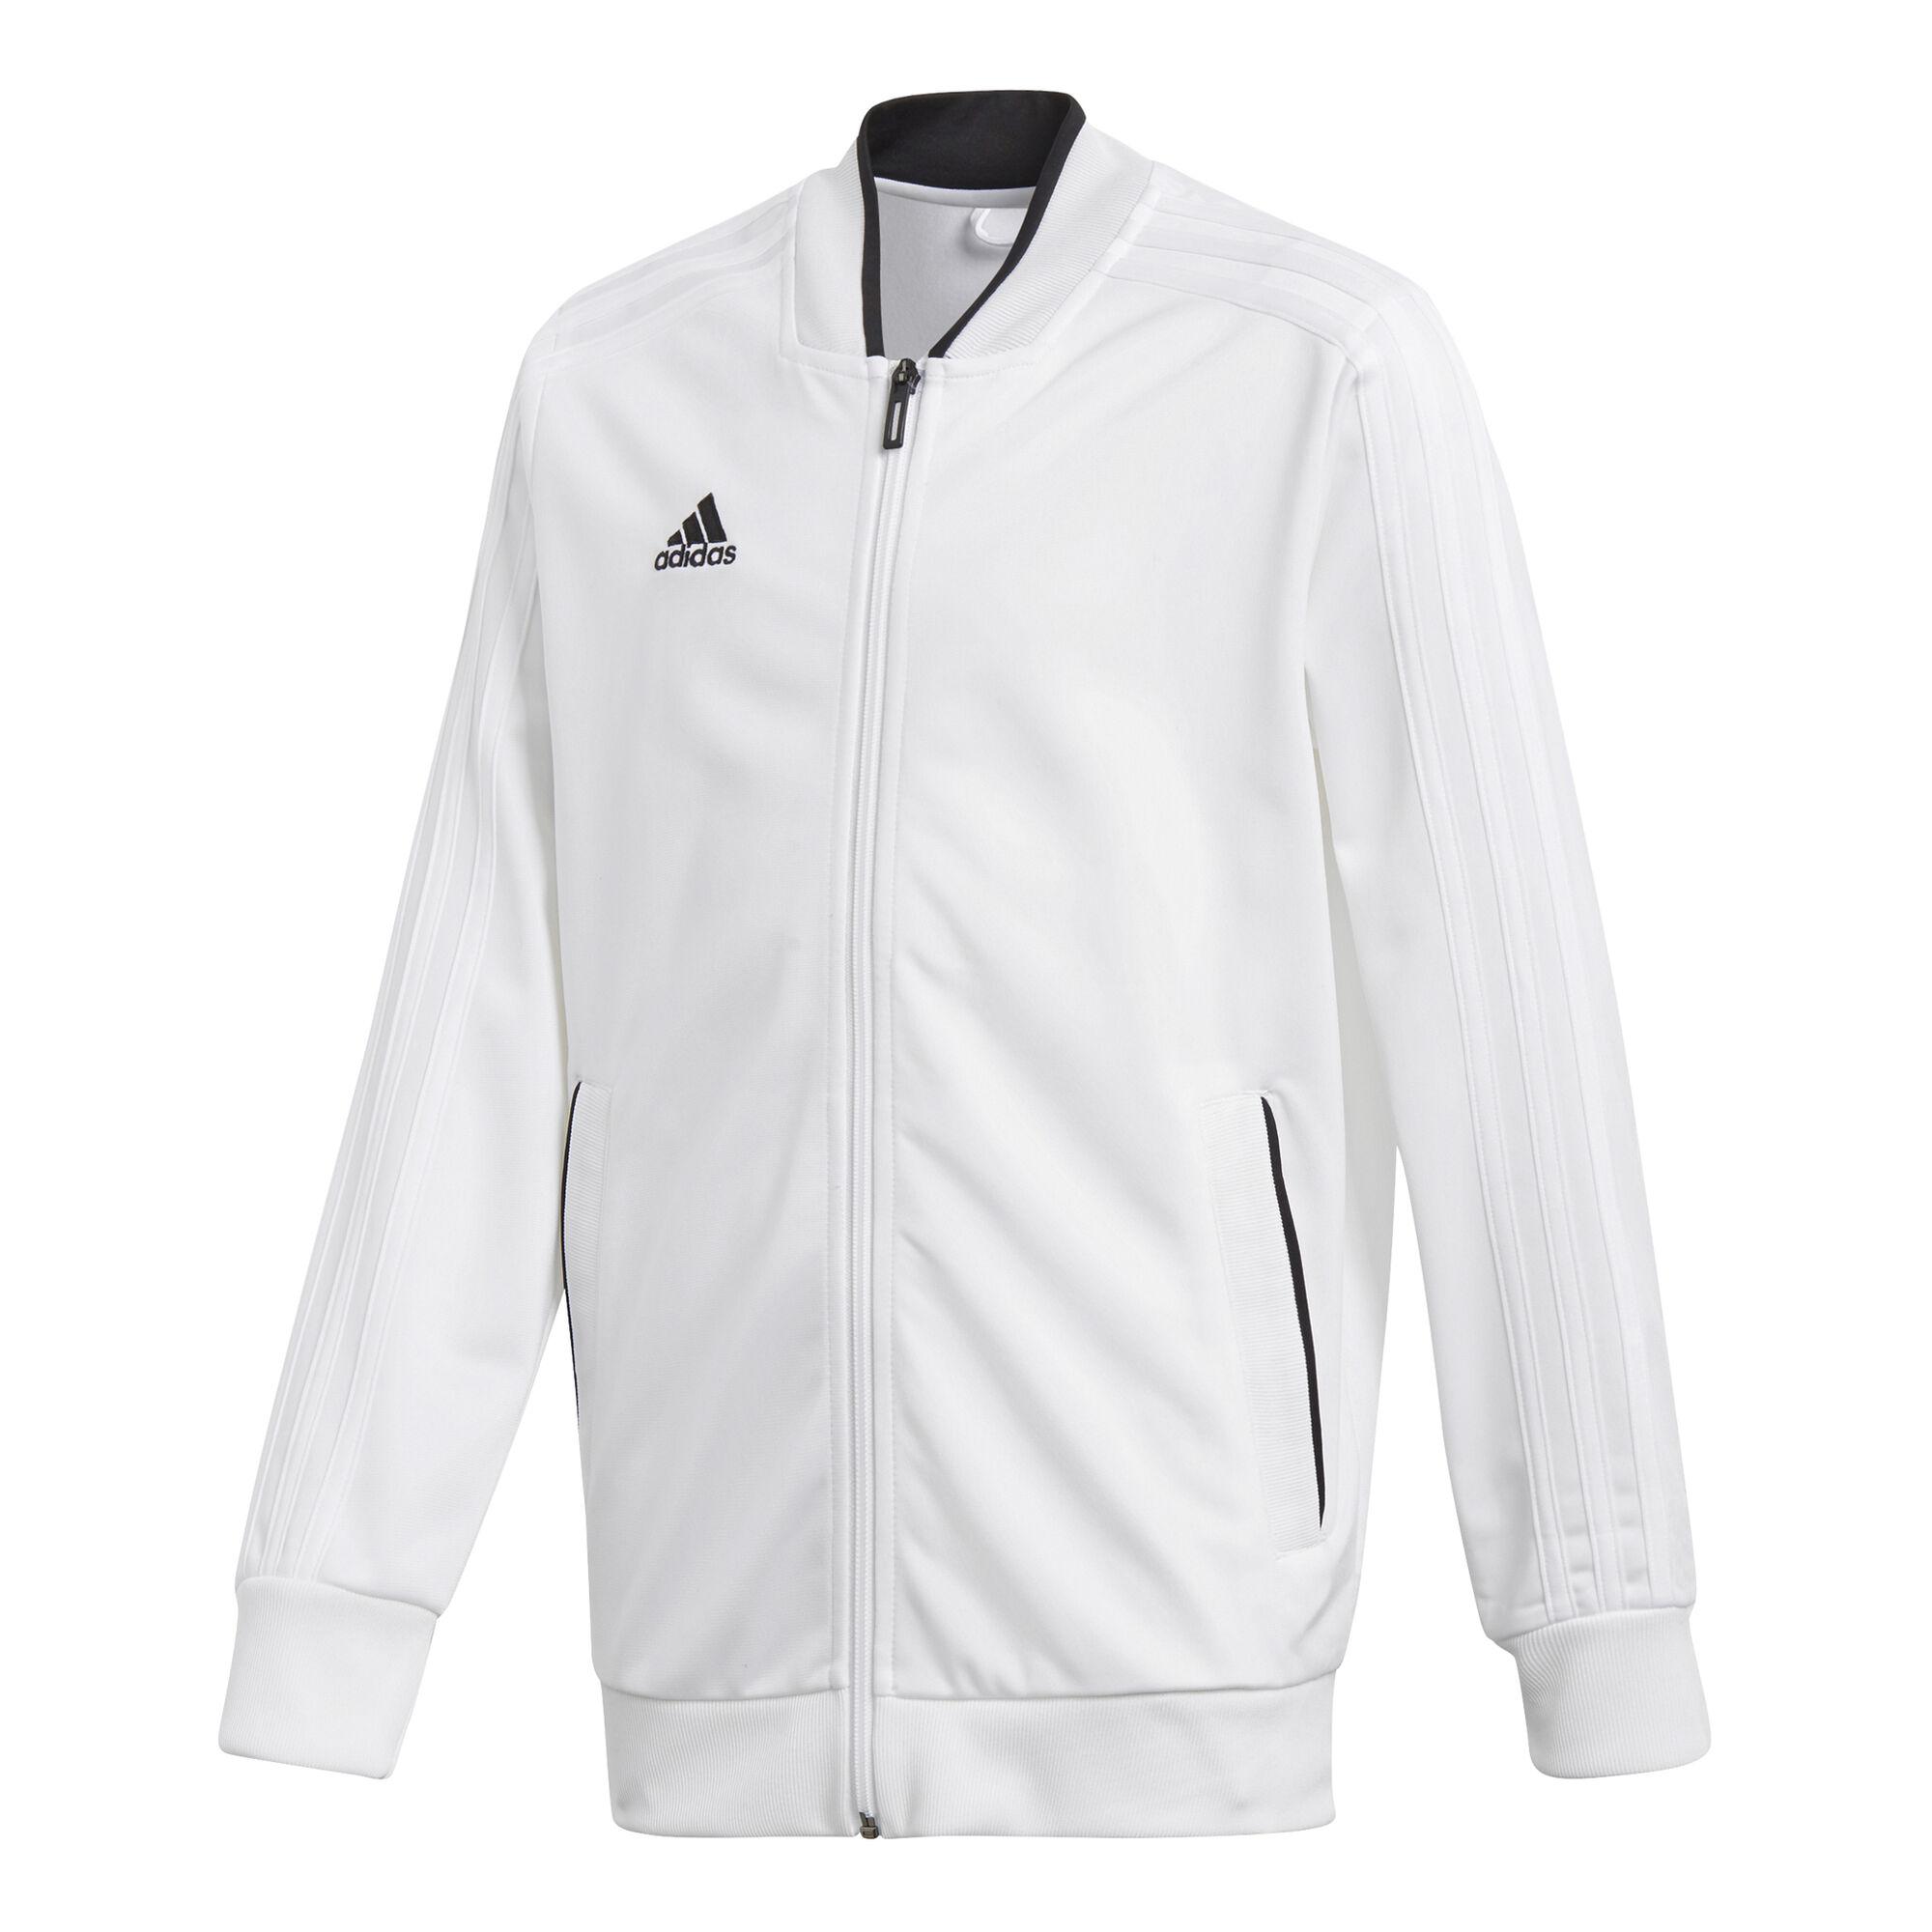 online store efee8 30dd9 adidas · adidas · adidas · adidas · adidas · adidas. Condivo 18 Jacket ...